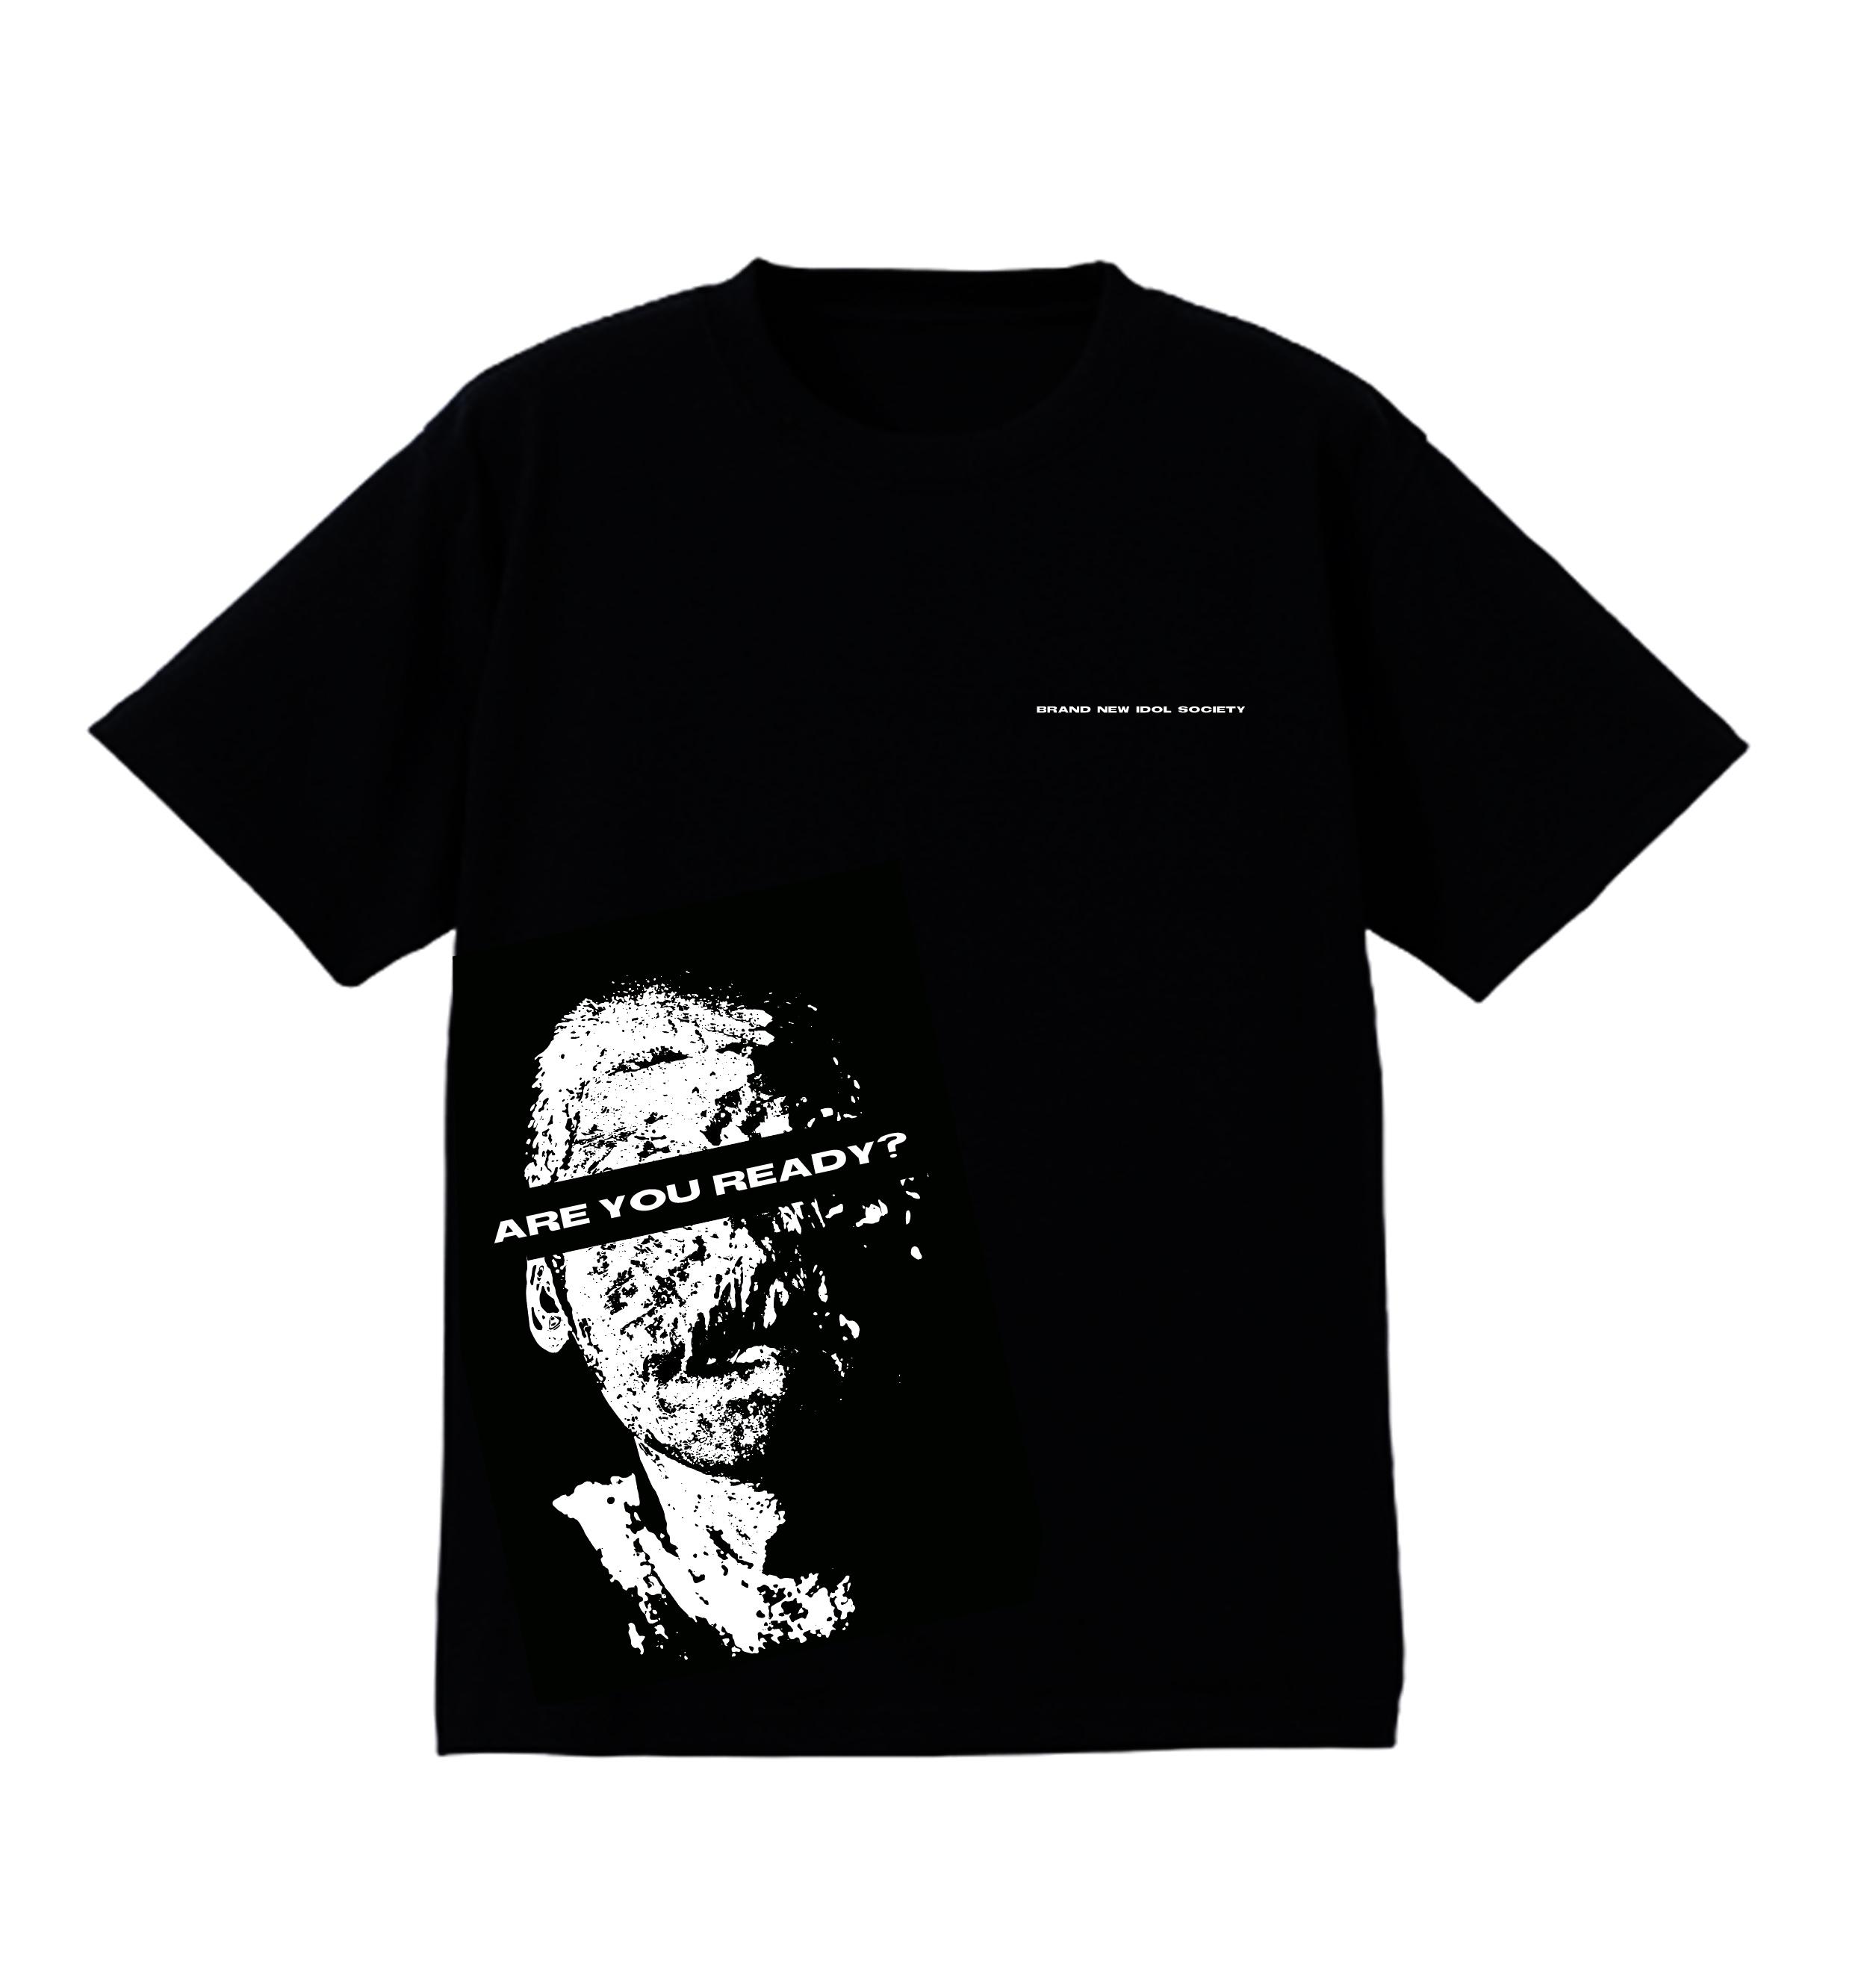 完全生産限定盤_T-shirts